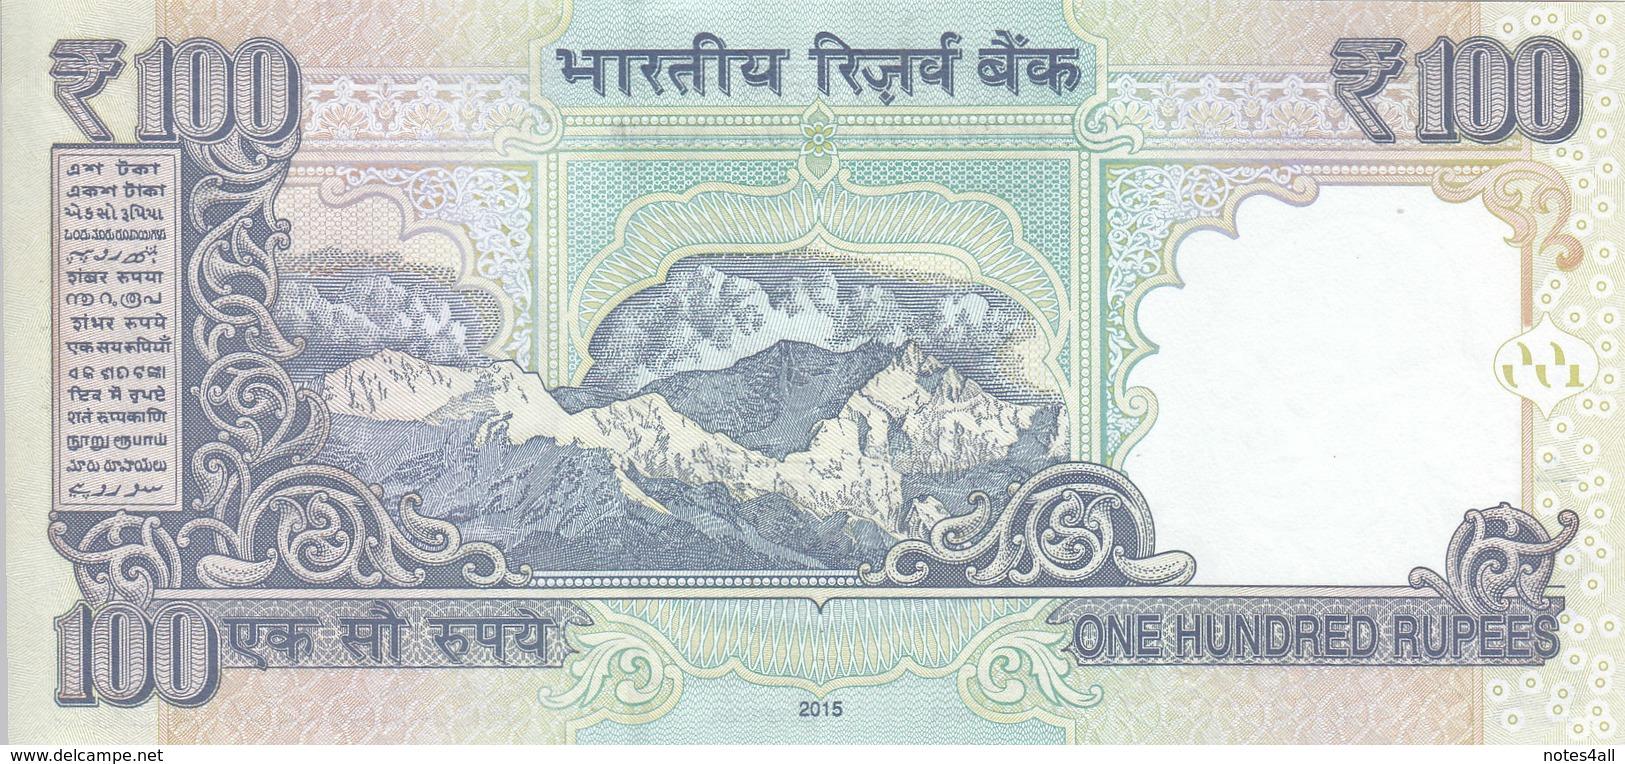 INDIA 100 RUPEES 2015 P 105 PREFIX AQ AU/UNC */* - India